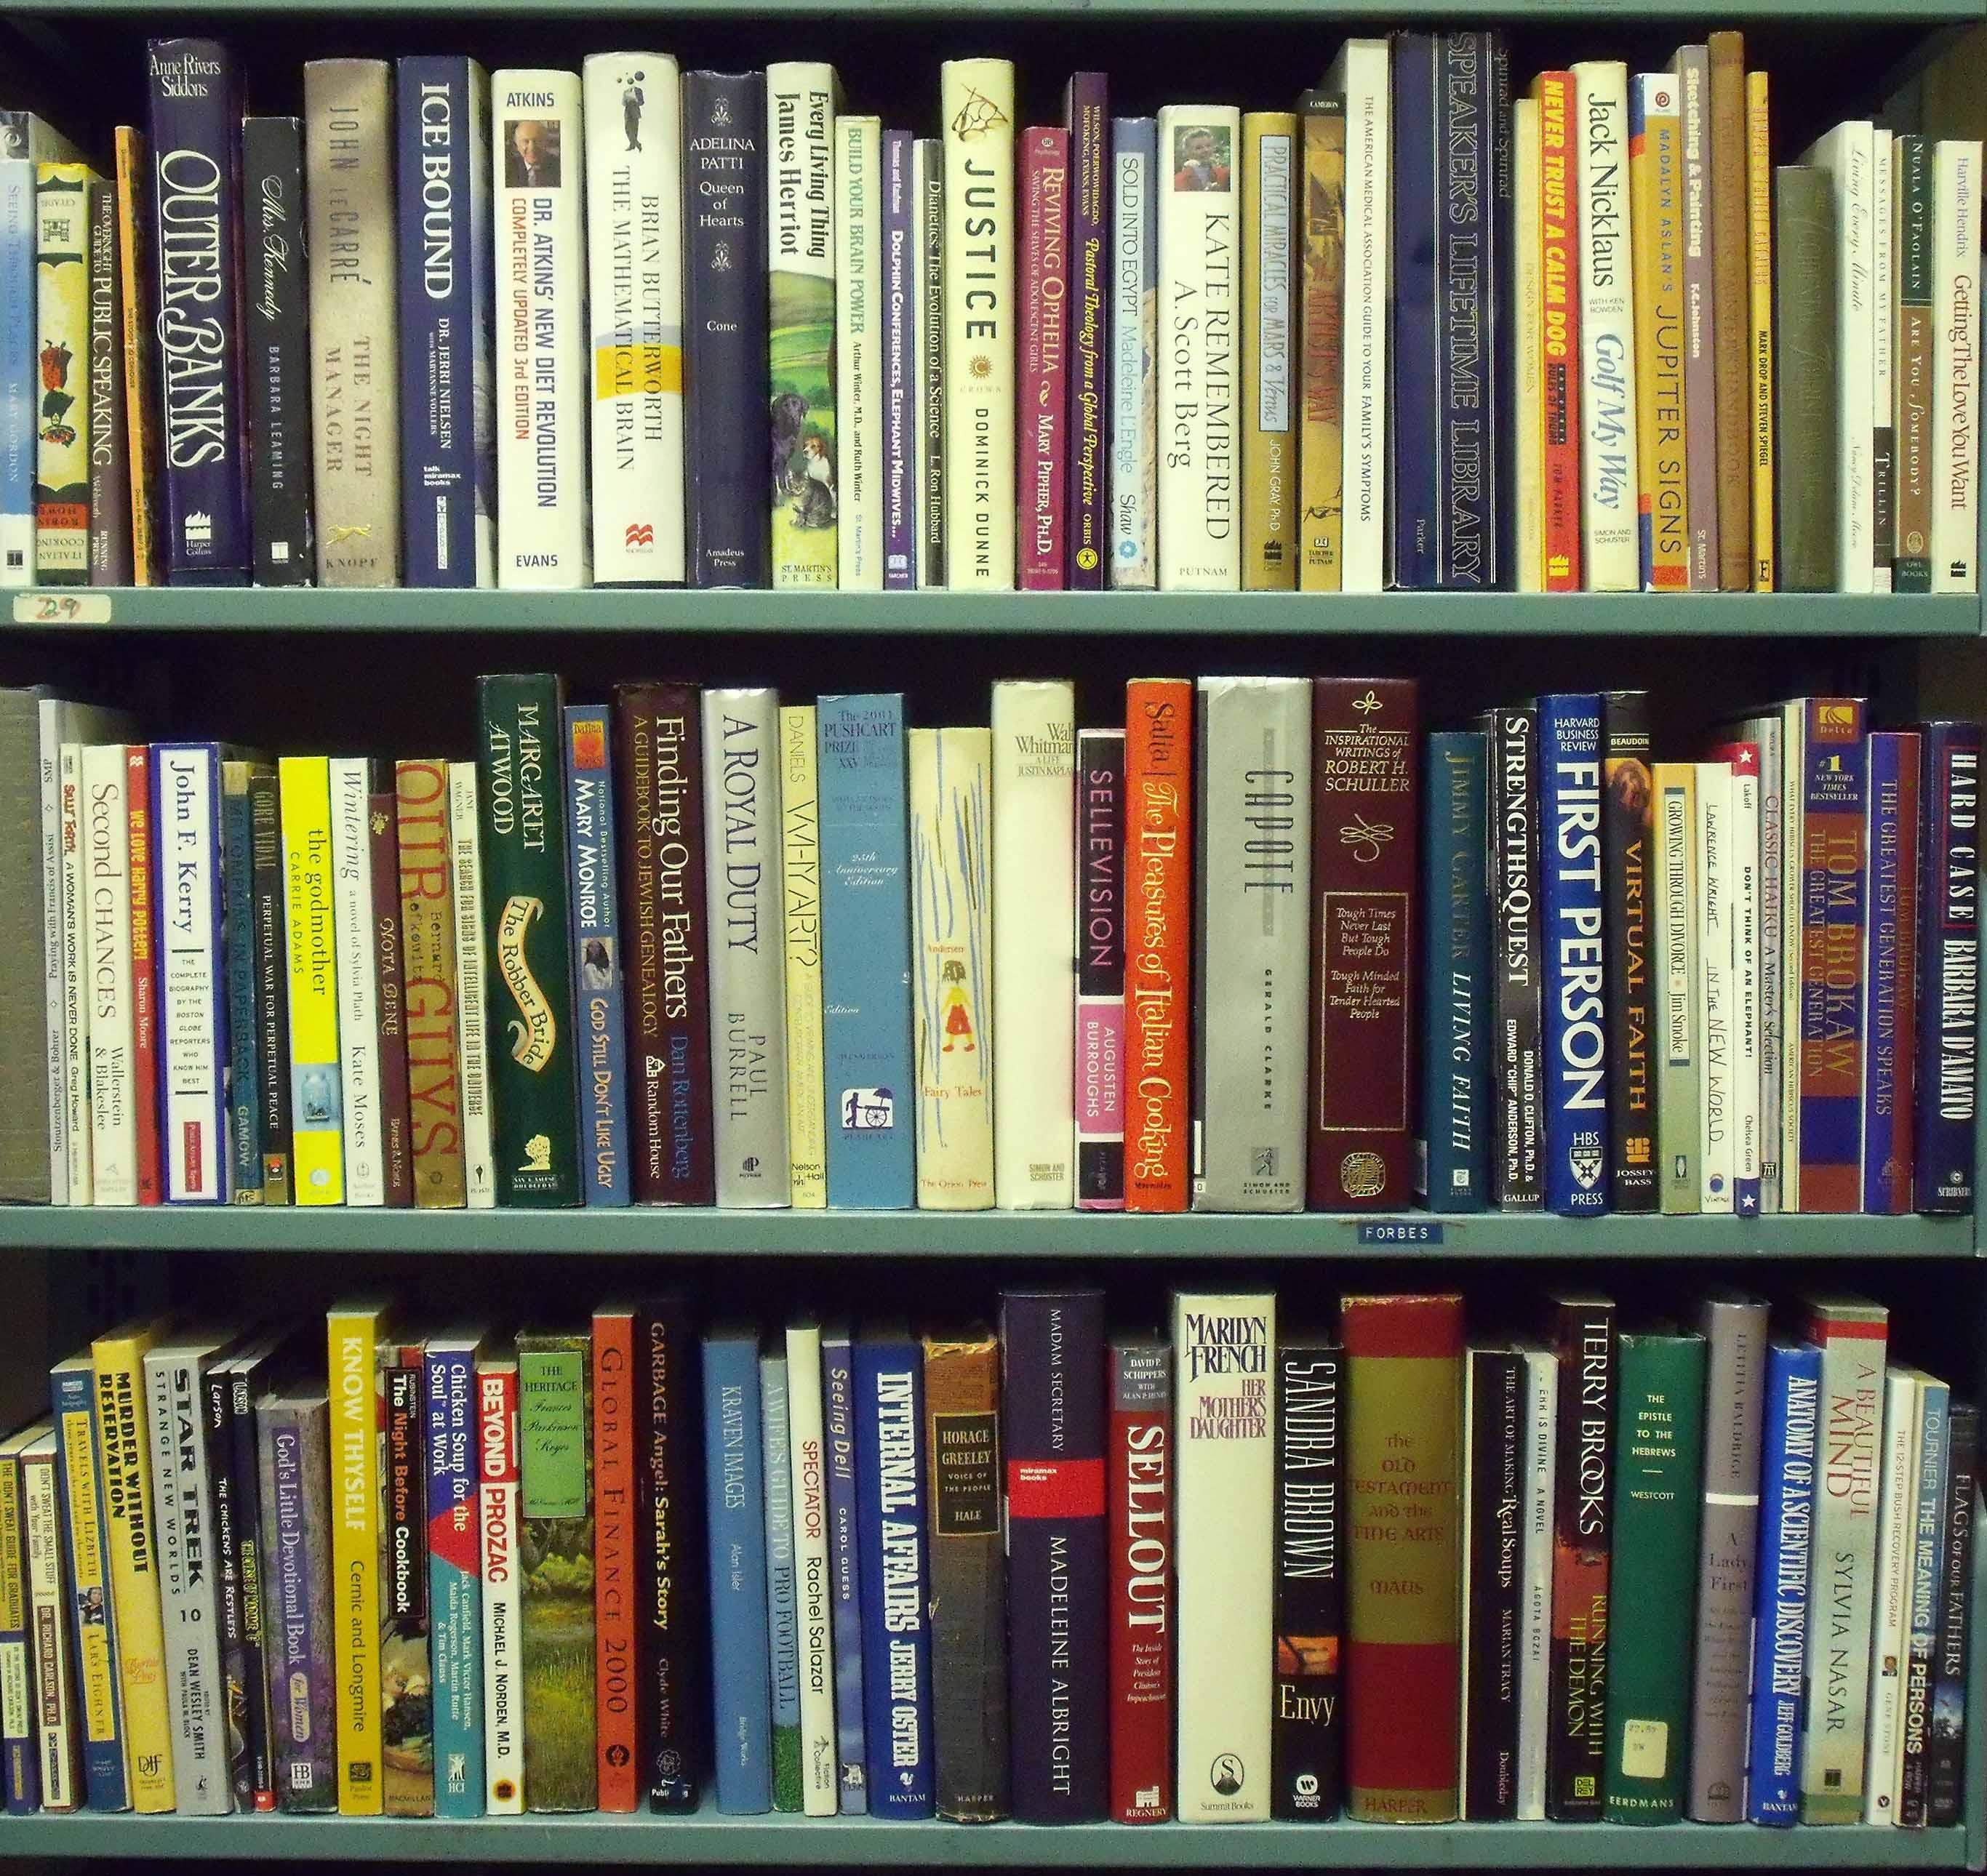 Leserbrief: Freude an Büchern eröffnet neue Perspektiven